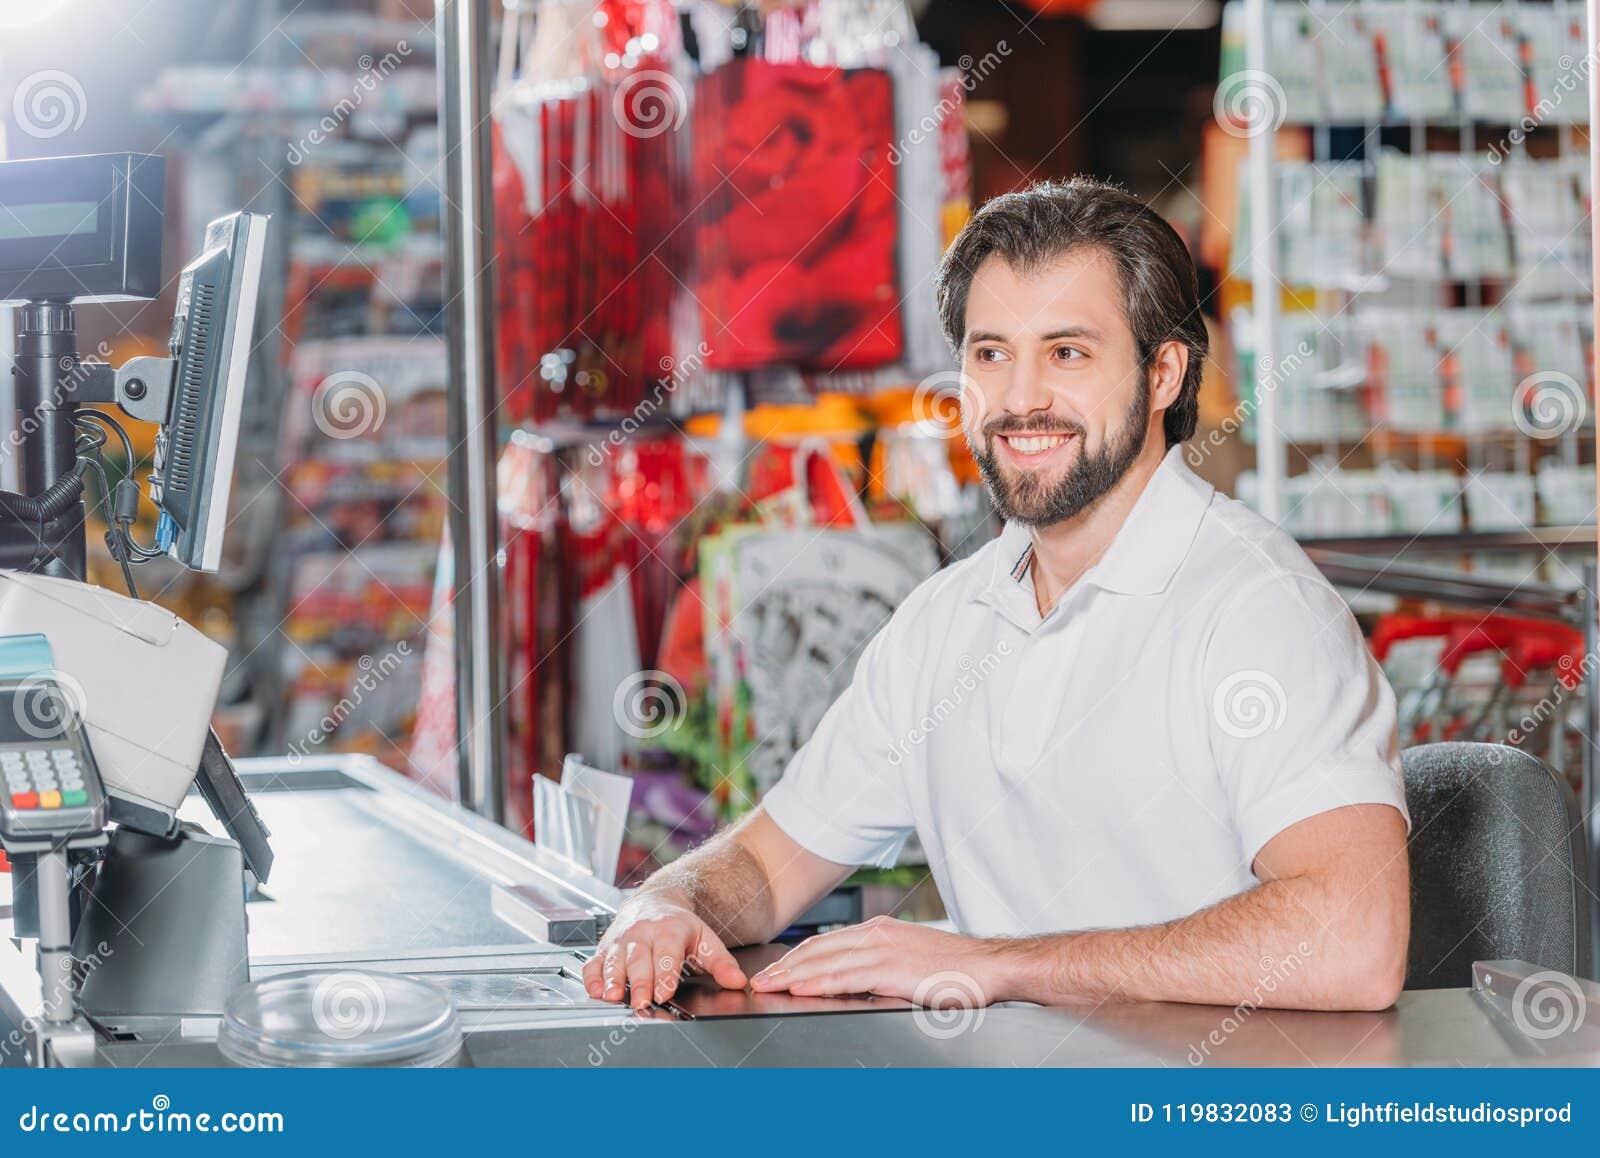 Portret van glimlachende mannelijke winkelmedewerker op contant geldpunt